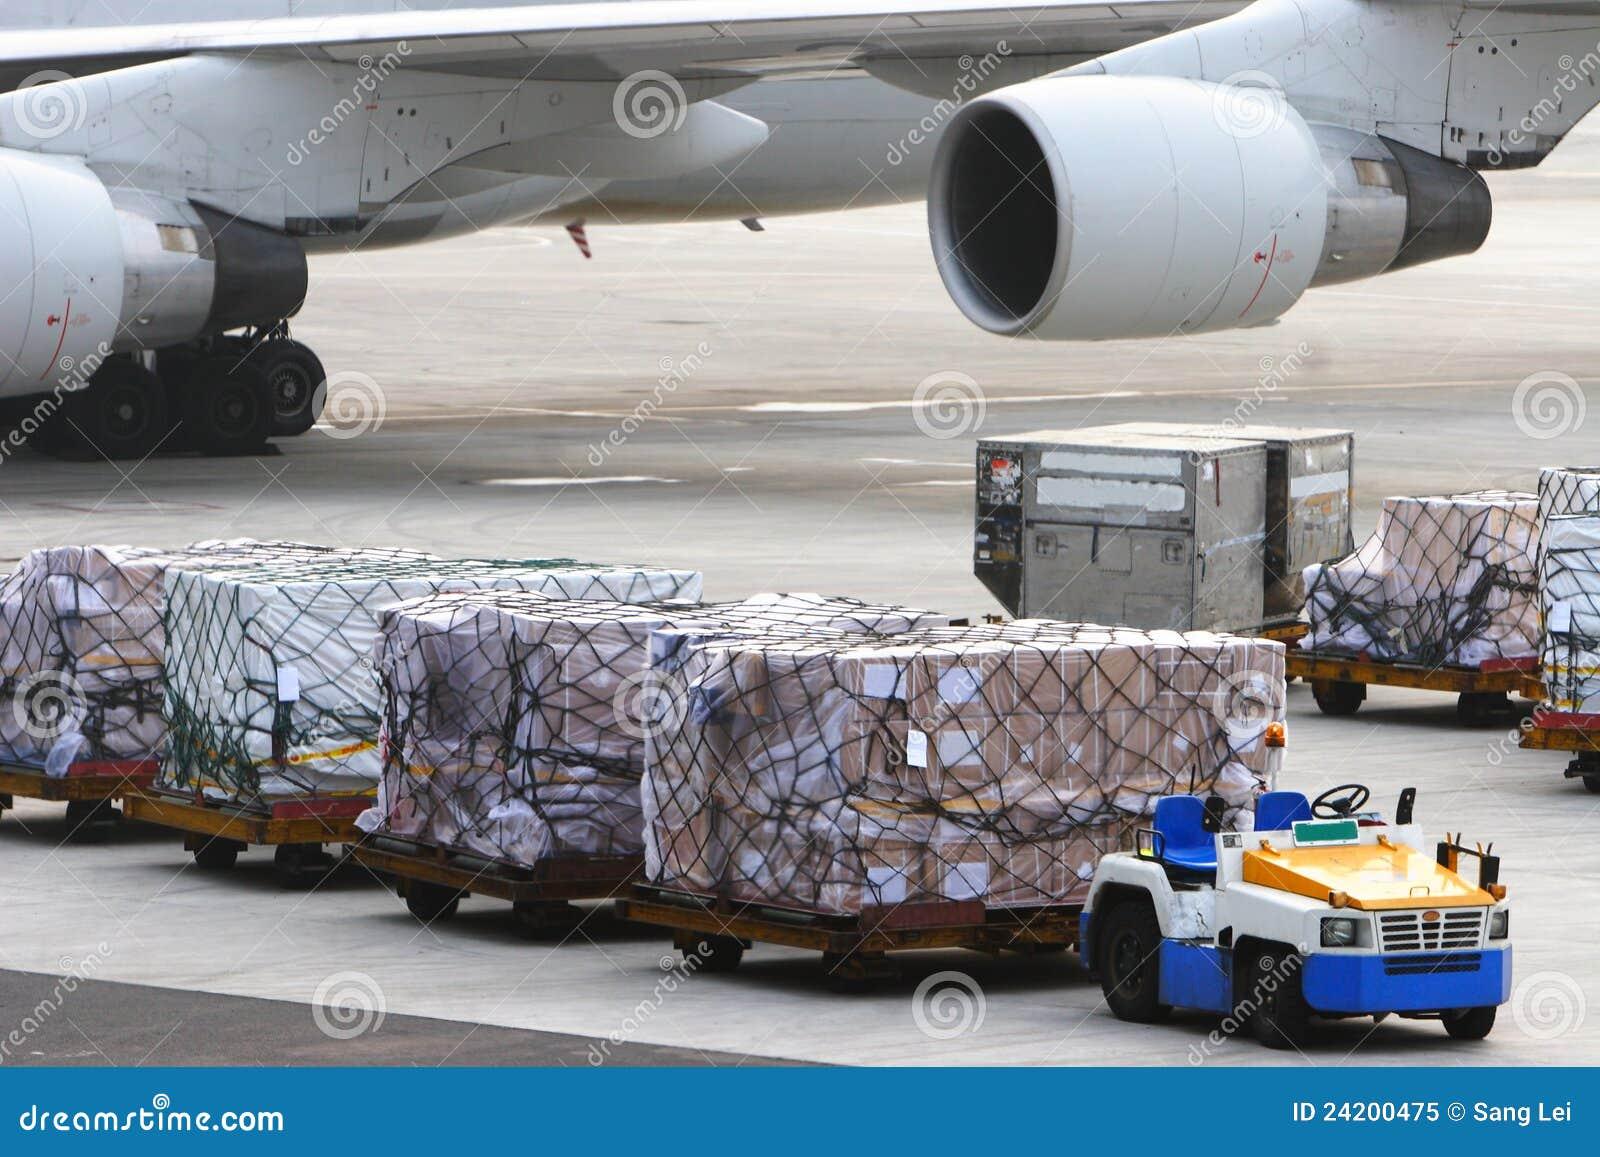 Airport Baggage Handling Royalty Free Stock Photo Image